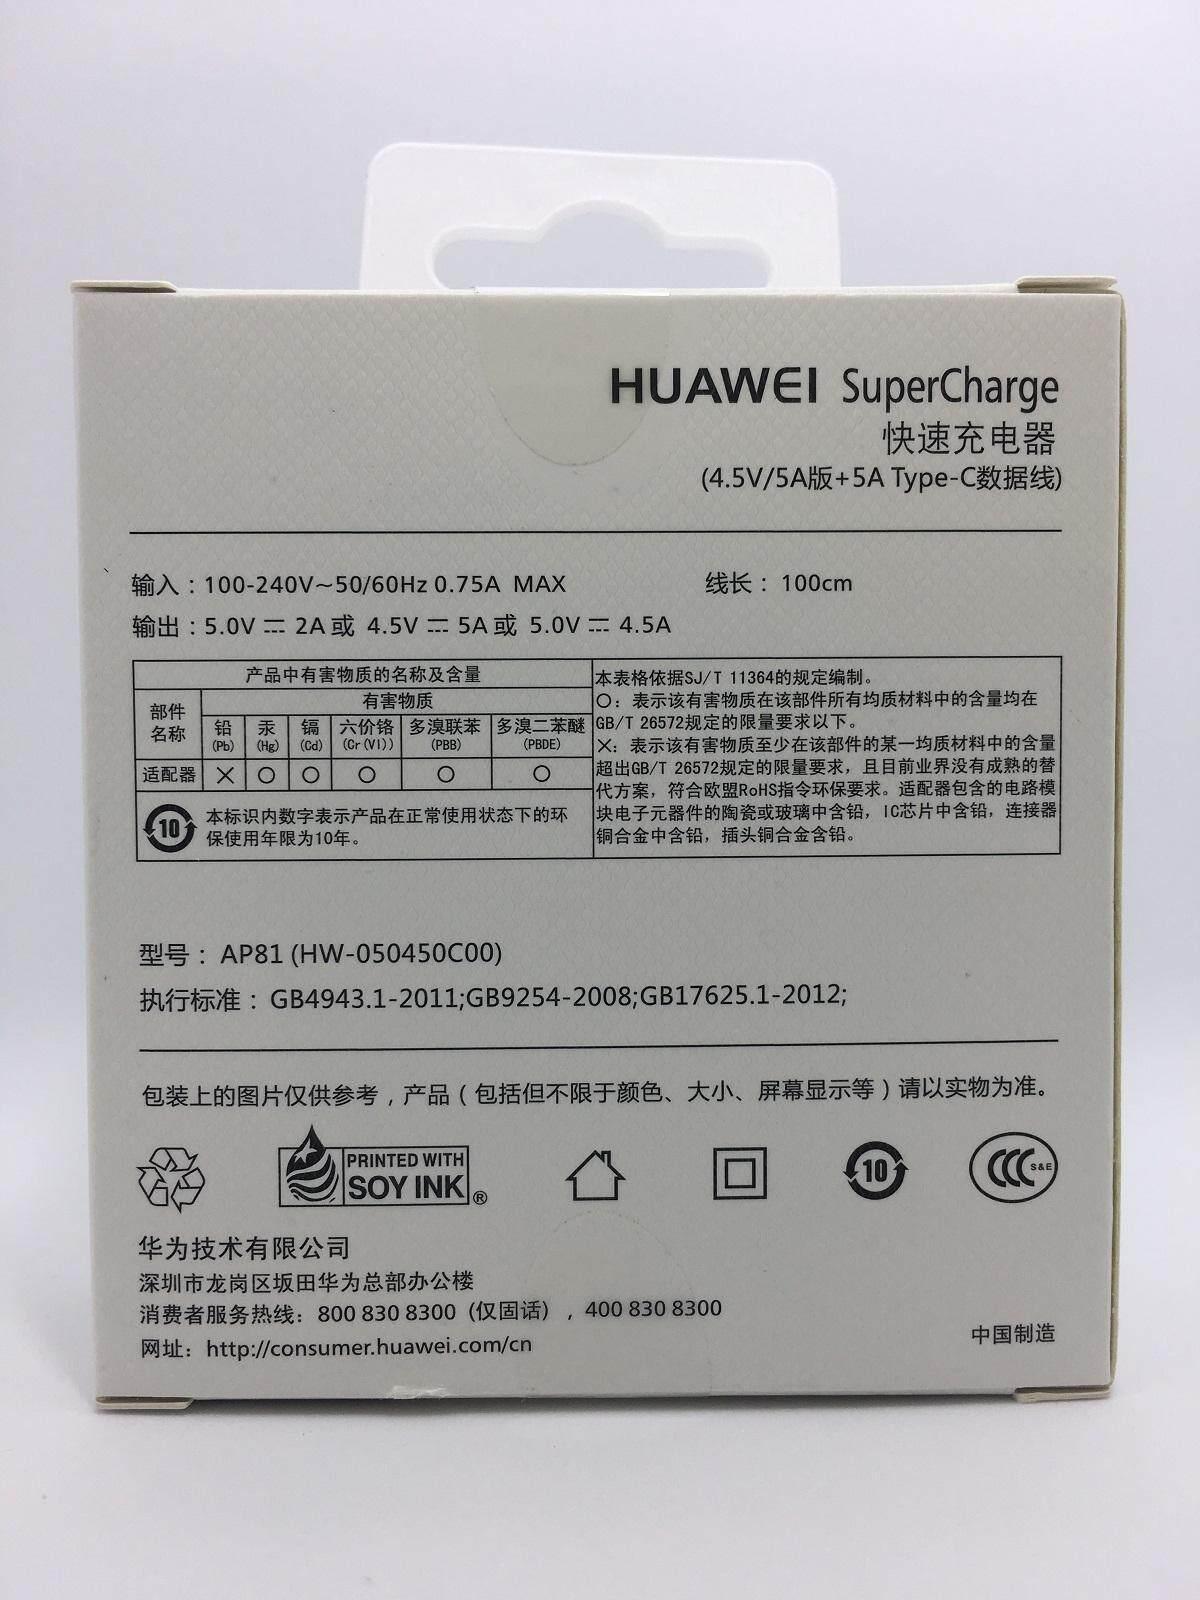 Charger_Huawei04.jpg